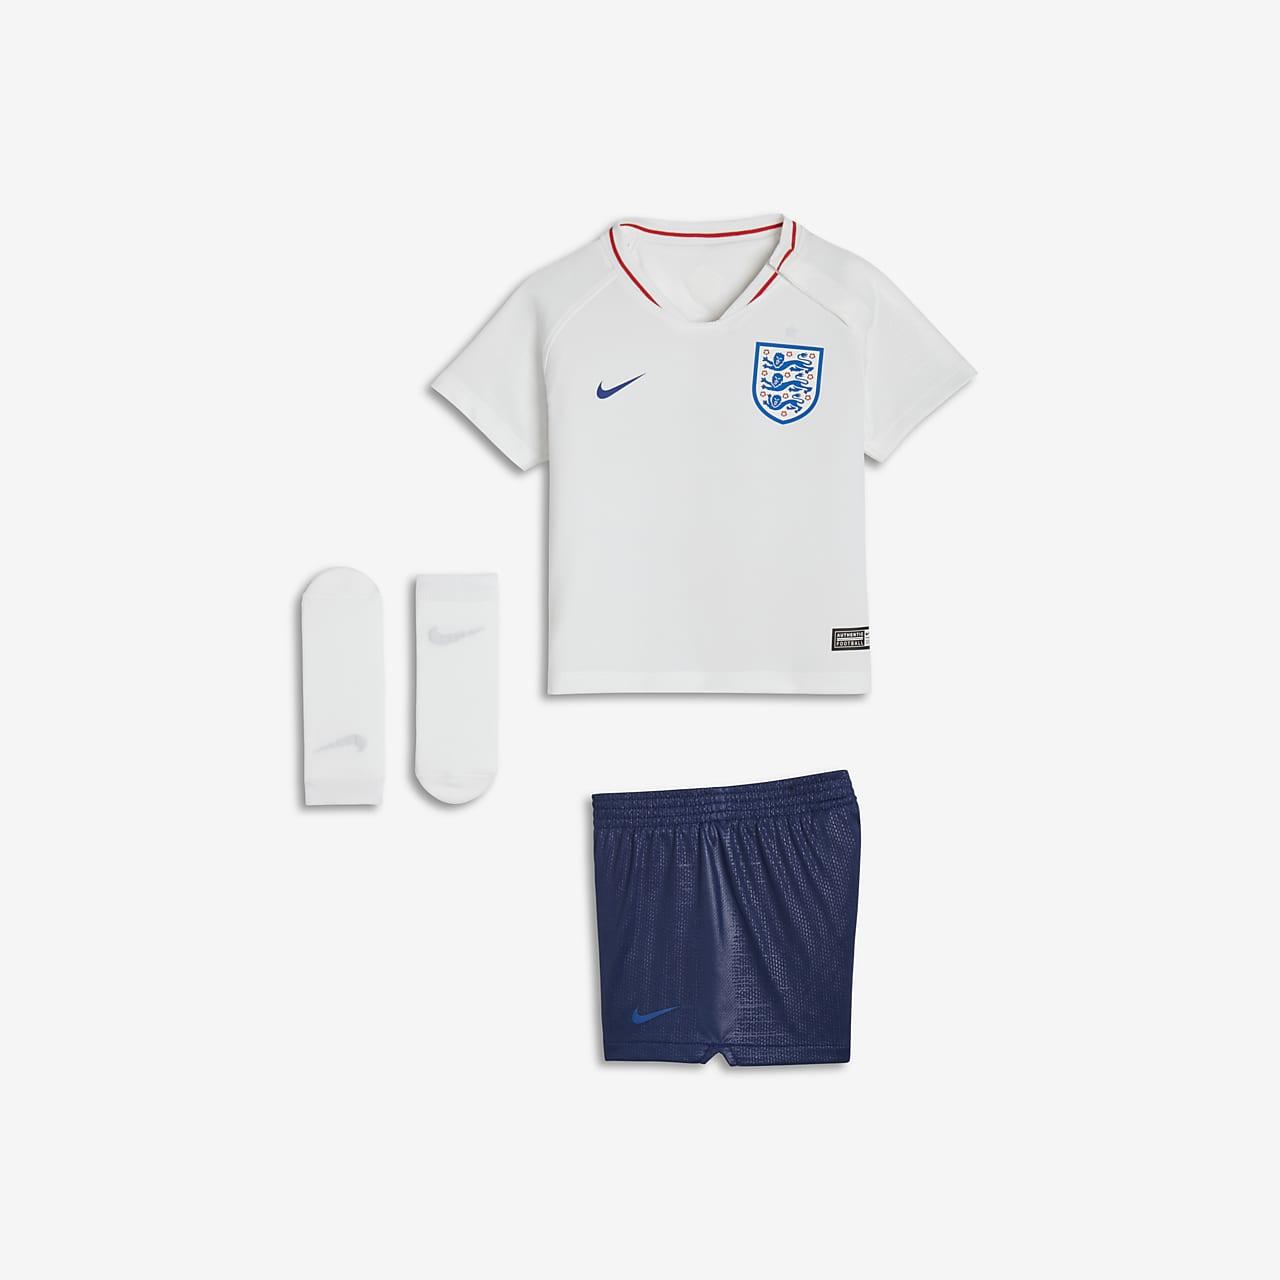 2018 England Stadium Home Baby & Toddler Football Kit